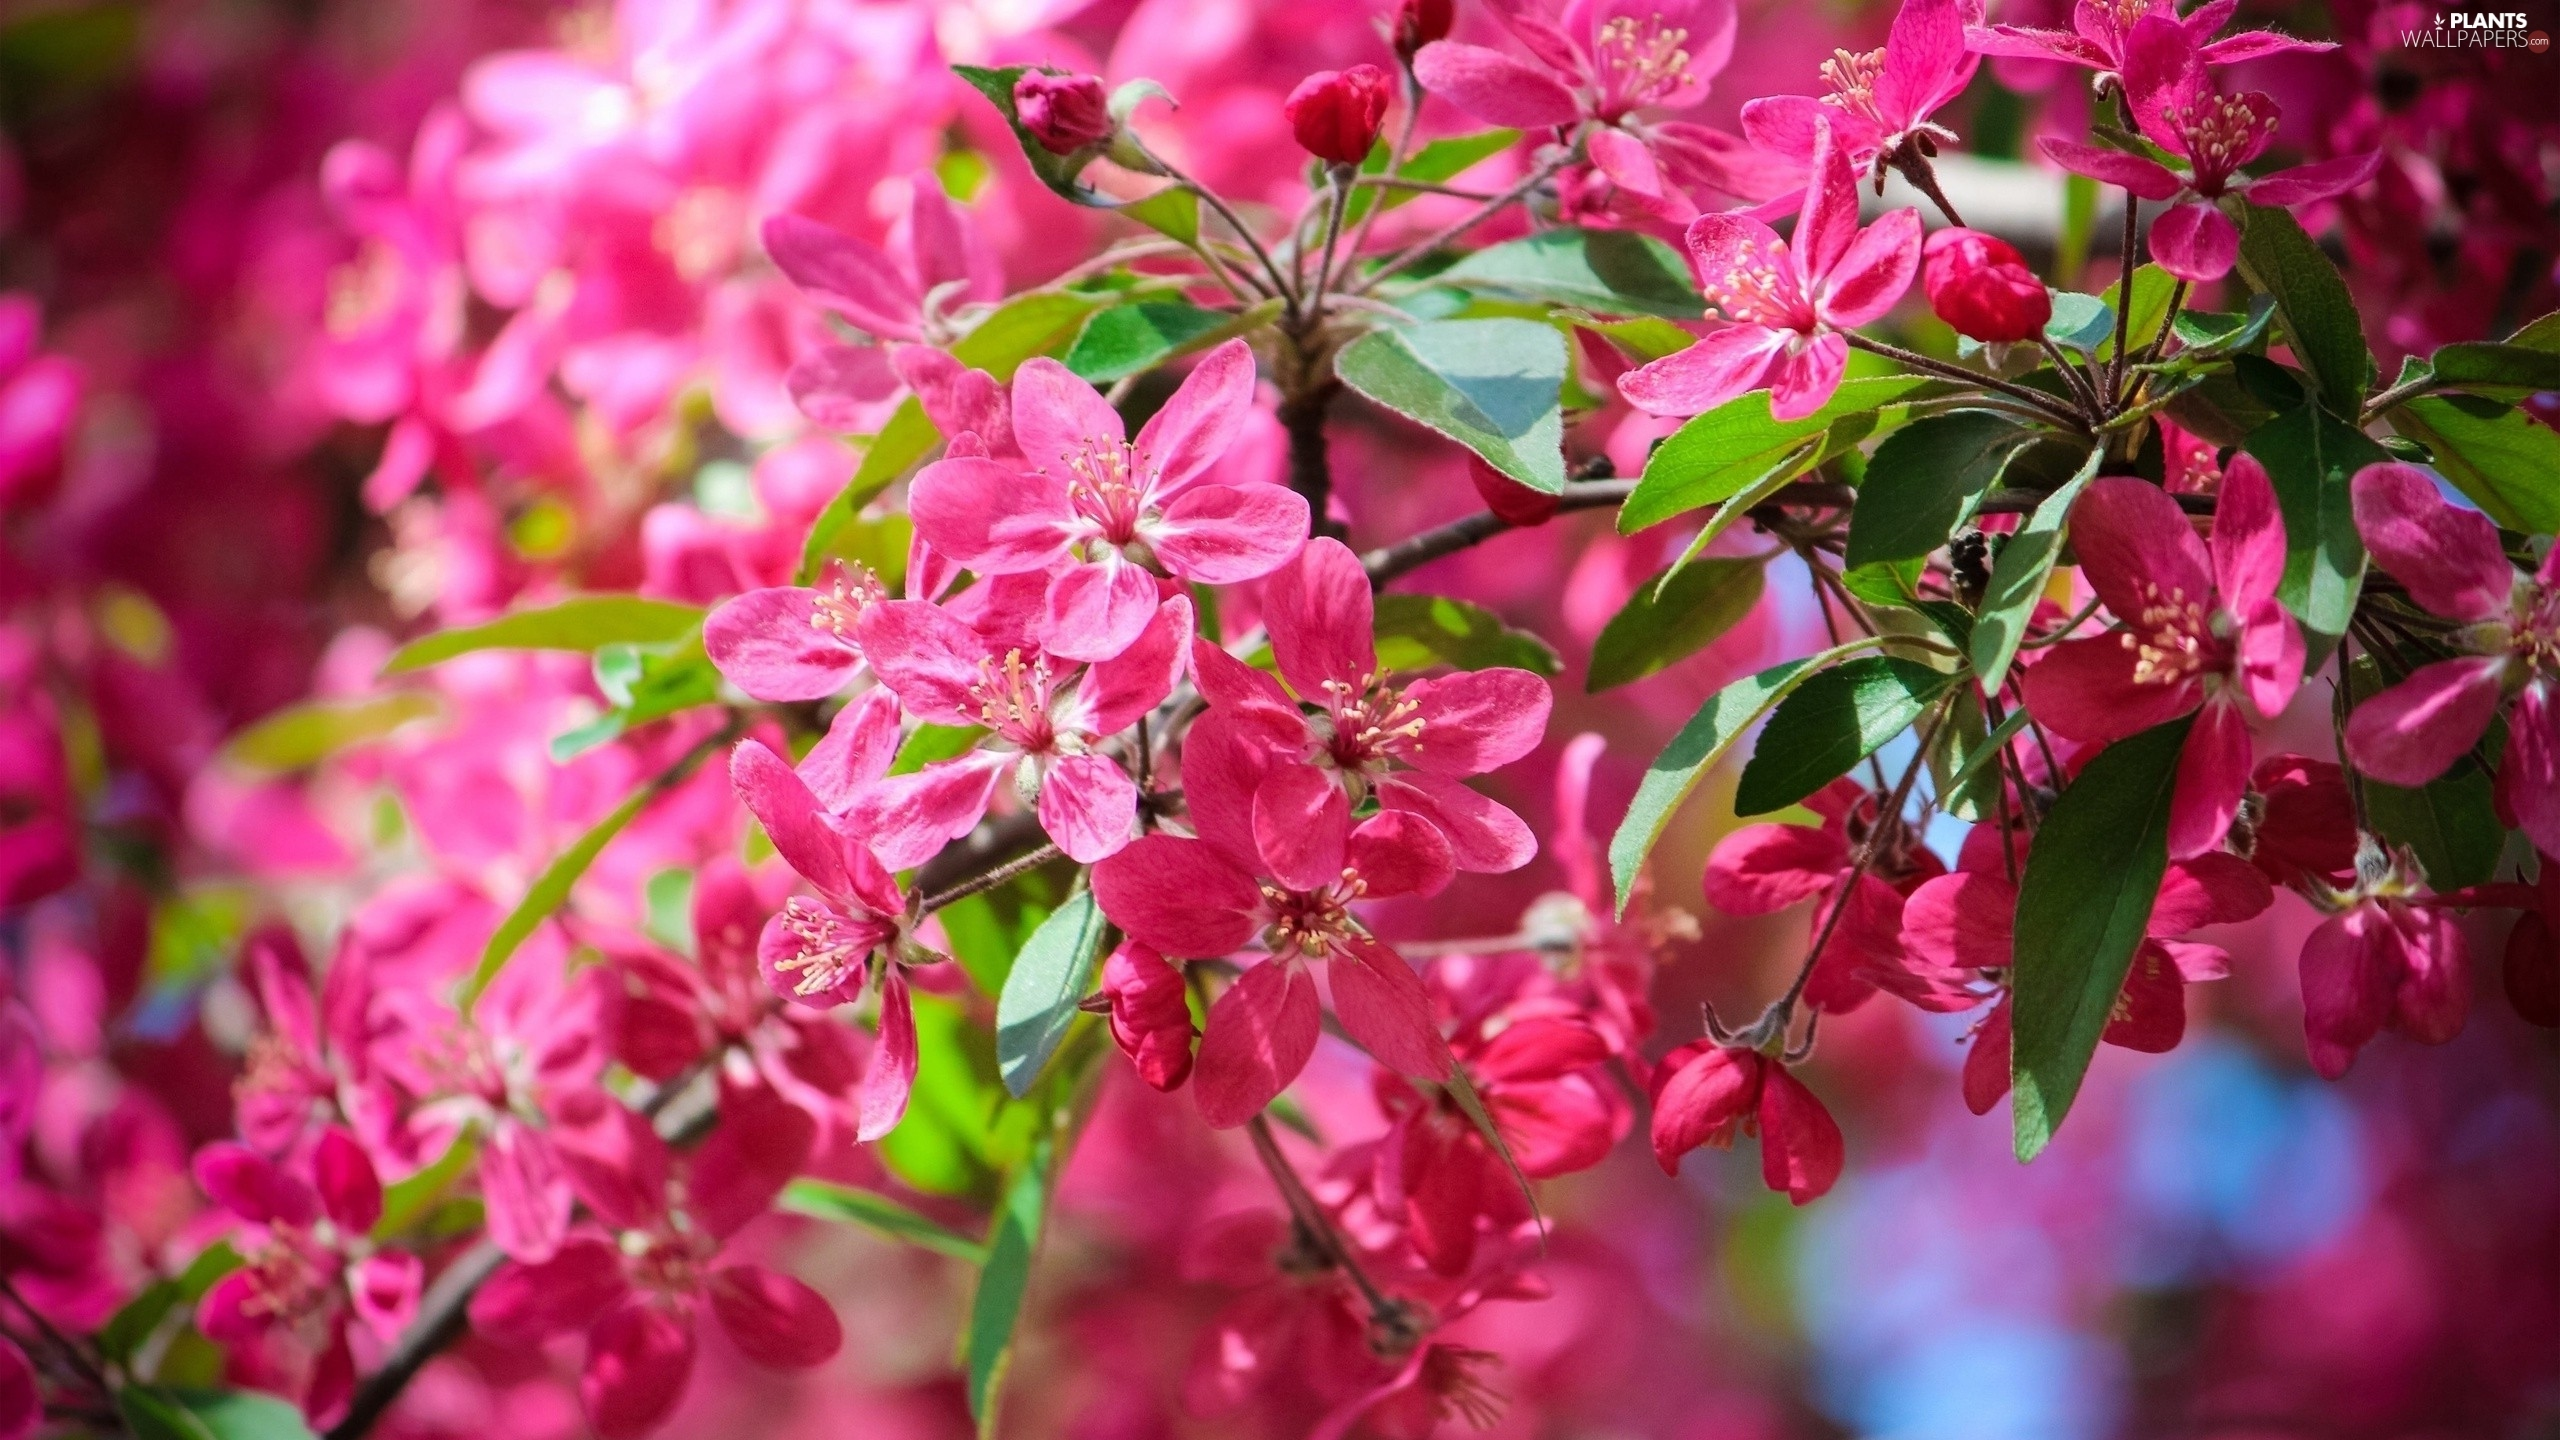 Pink Fruit Tree Flowers Plants Wallpapers 2560x1440